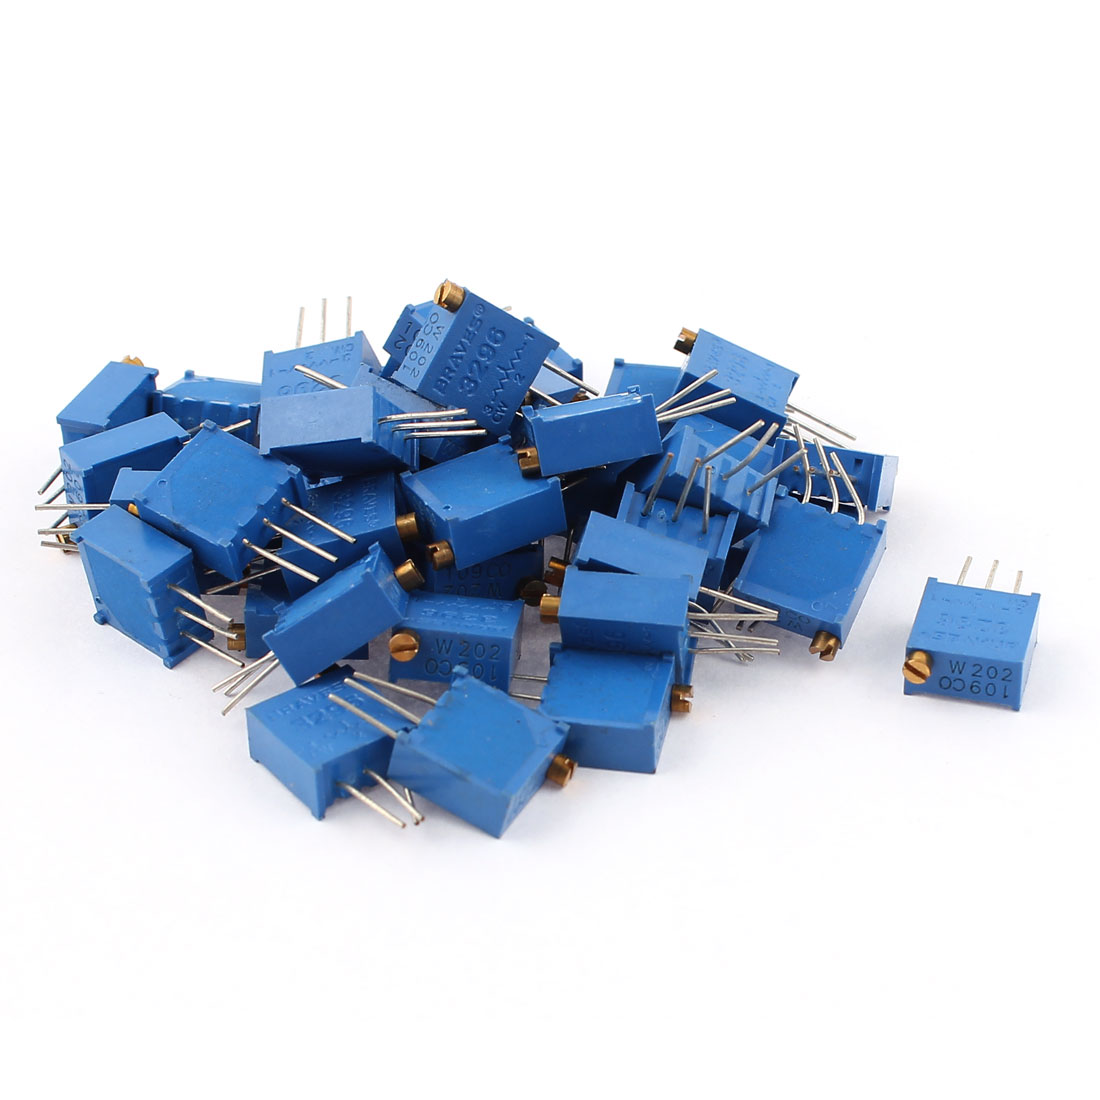 40Pcs Potentiometer Trimmer Trimpot Trim Pot Variable Resistor 3296W-202 2K Ohm